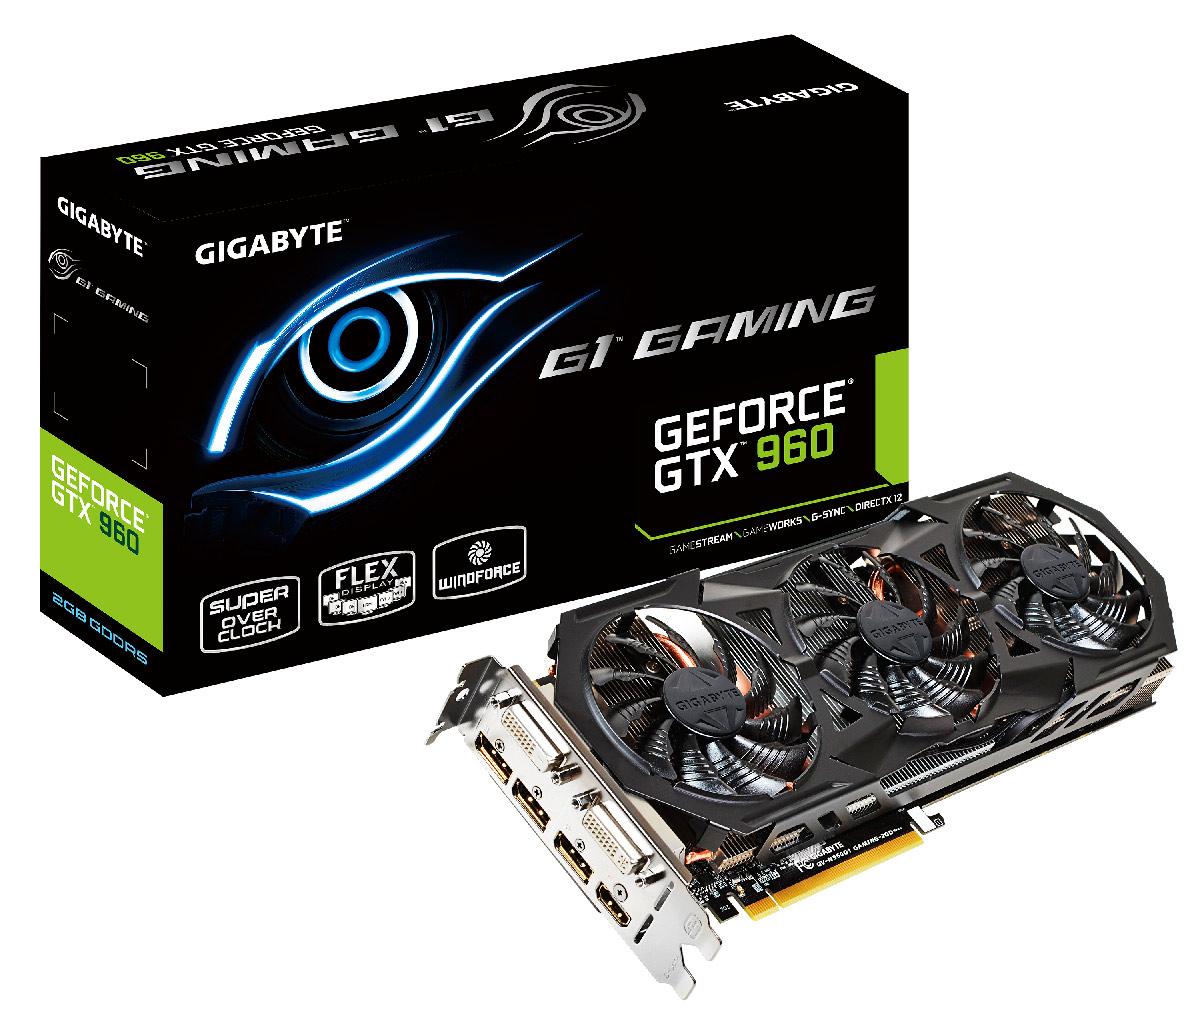 Gigabyte-GeForce-GTX-960-G1-Gaming-Oficial